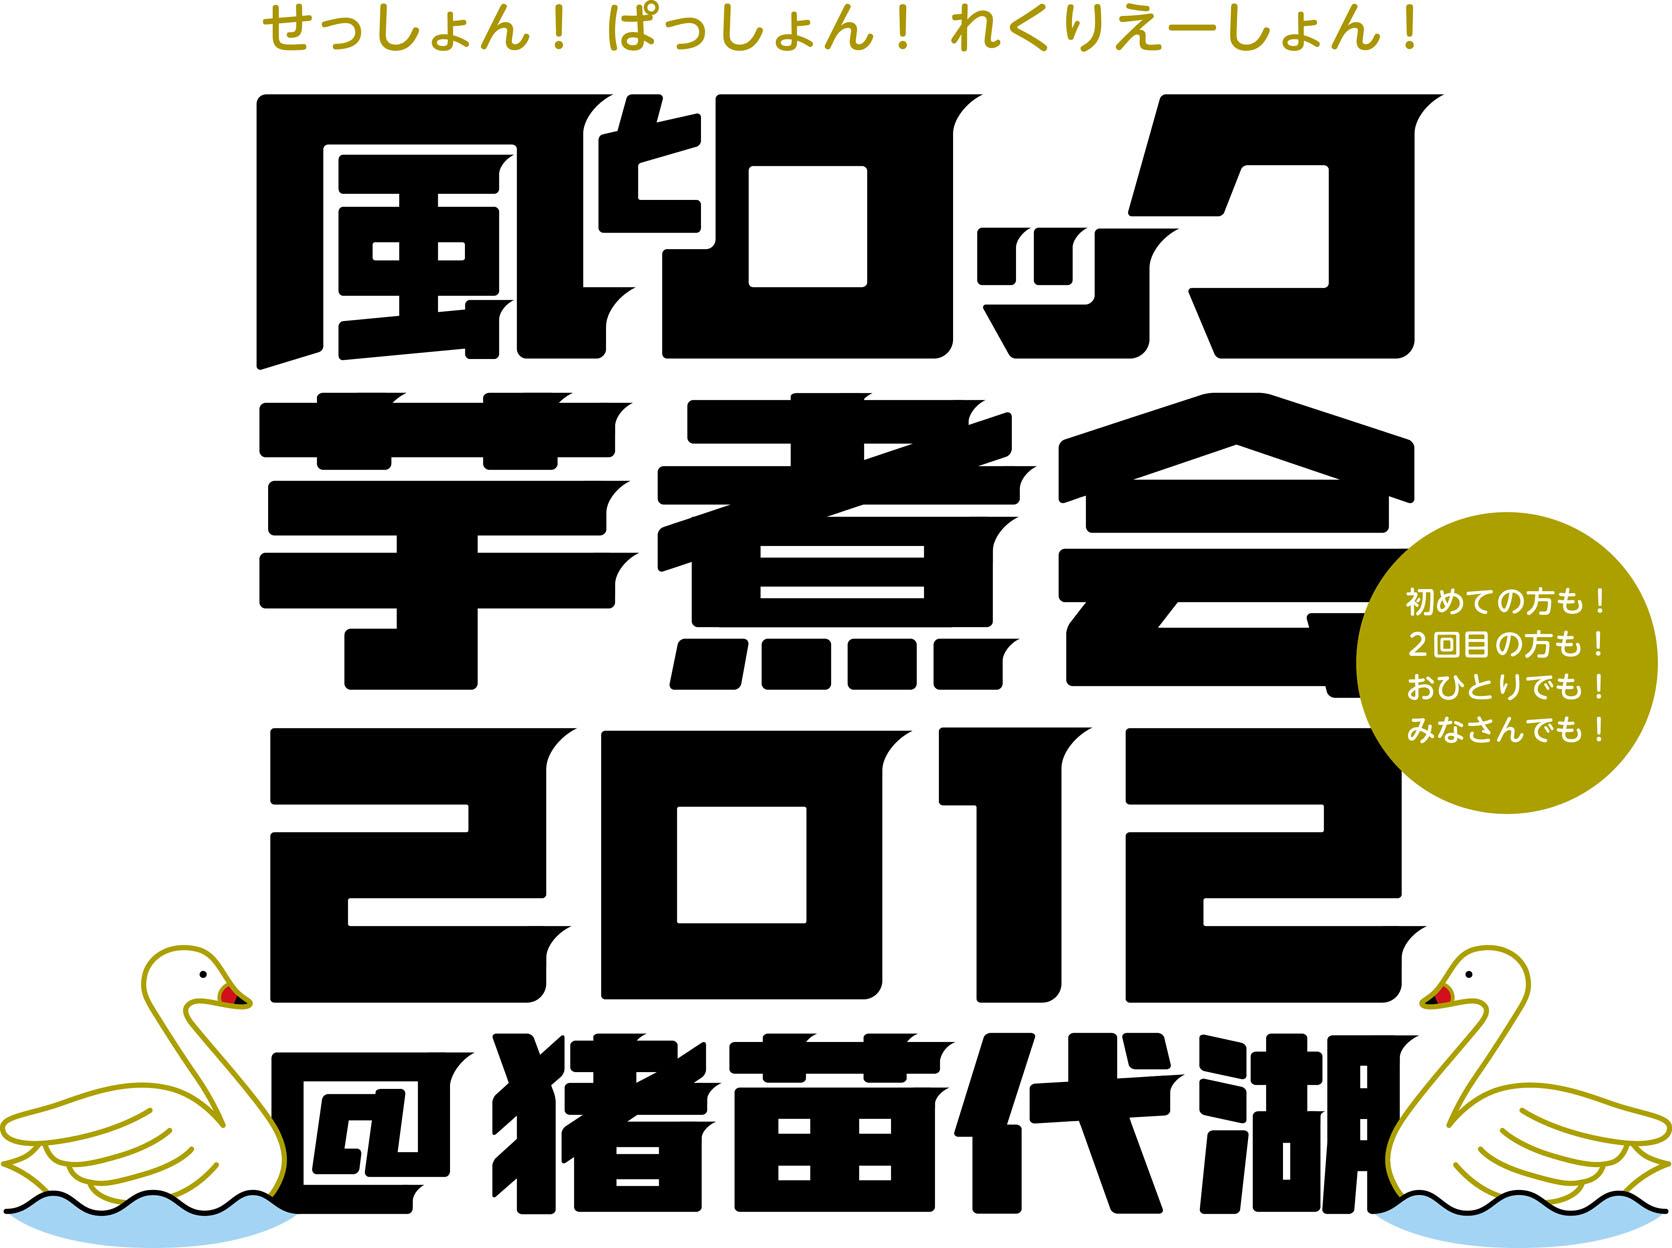 logo この夏、猪苗代湖をサンバさせた名曲 「風とロック芋煮会2012@猪... 風とロック芋